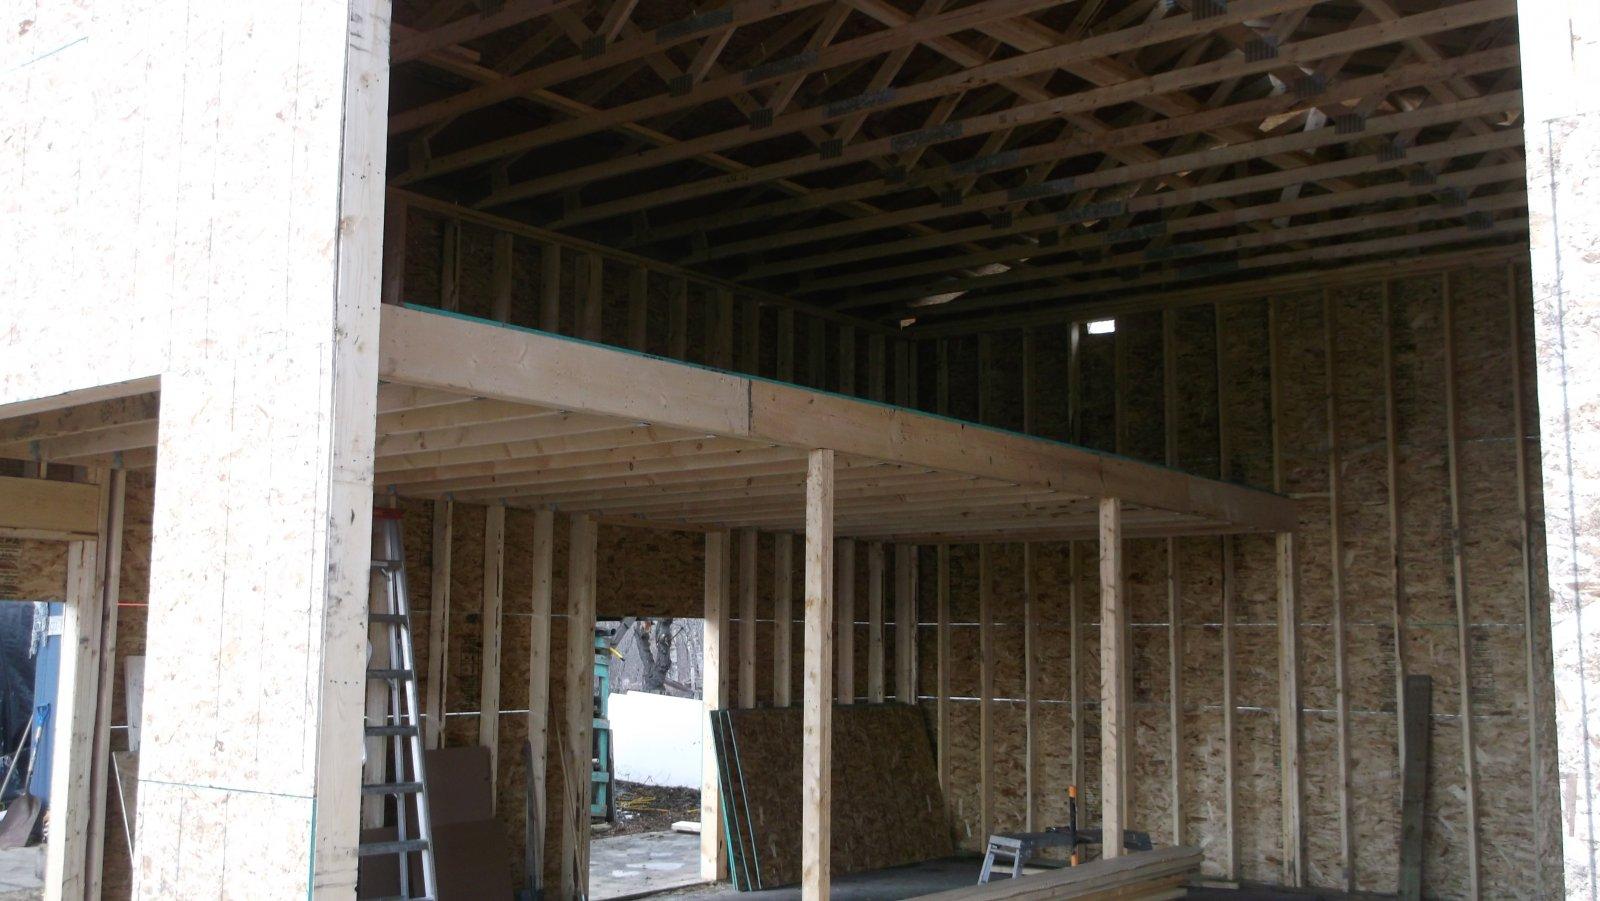 Click image for larger version  Name:garage loft 001.jpg Views:49 Size:204.2 KB ID:62260